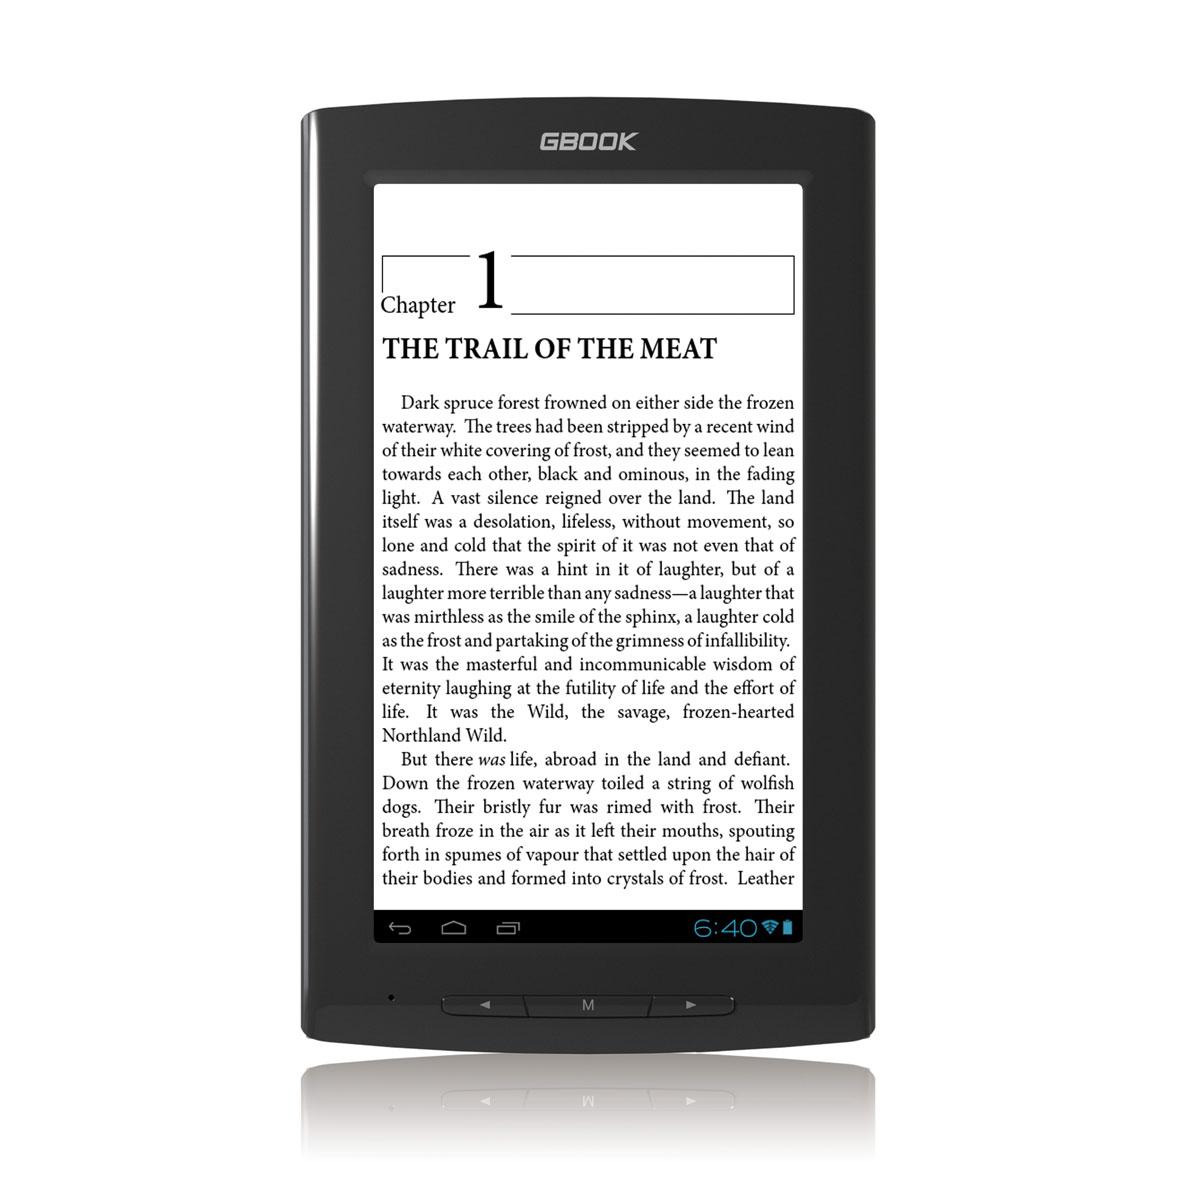 "Liseuse eBook Arnova GBOOK - 4 Go Liseuse eBook tactile de 7"" sous Android 4.0"